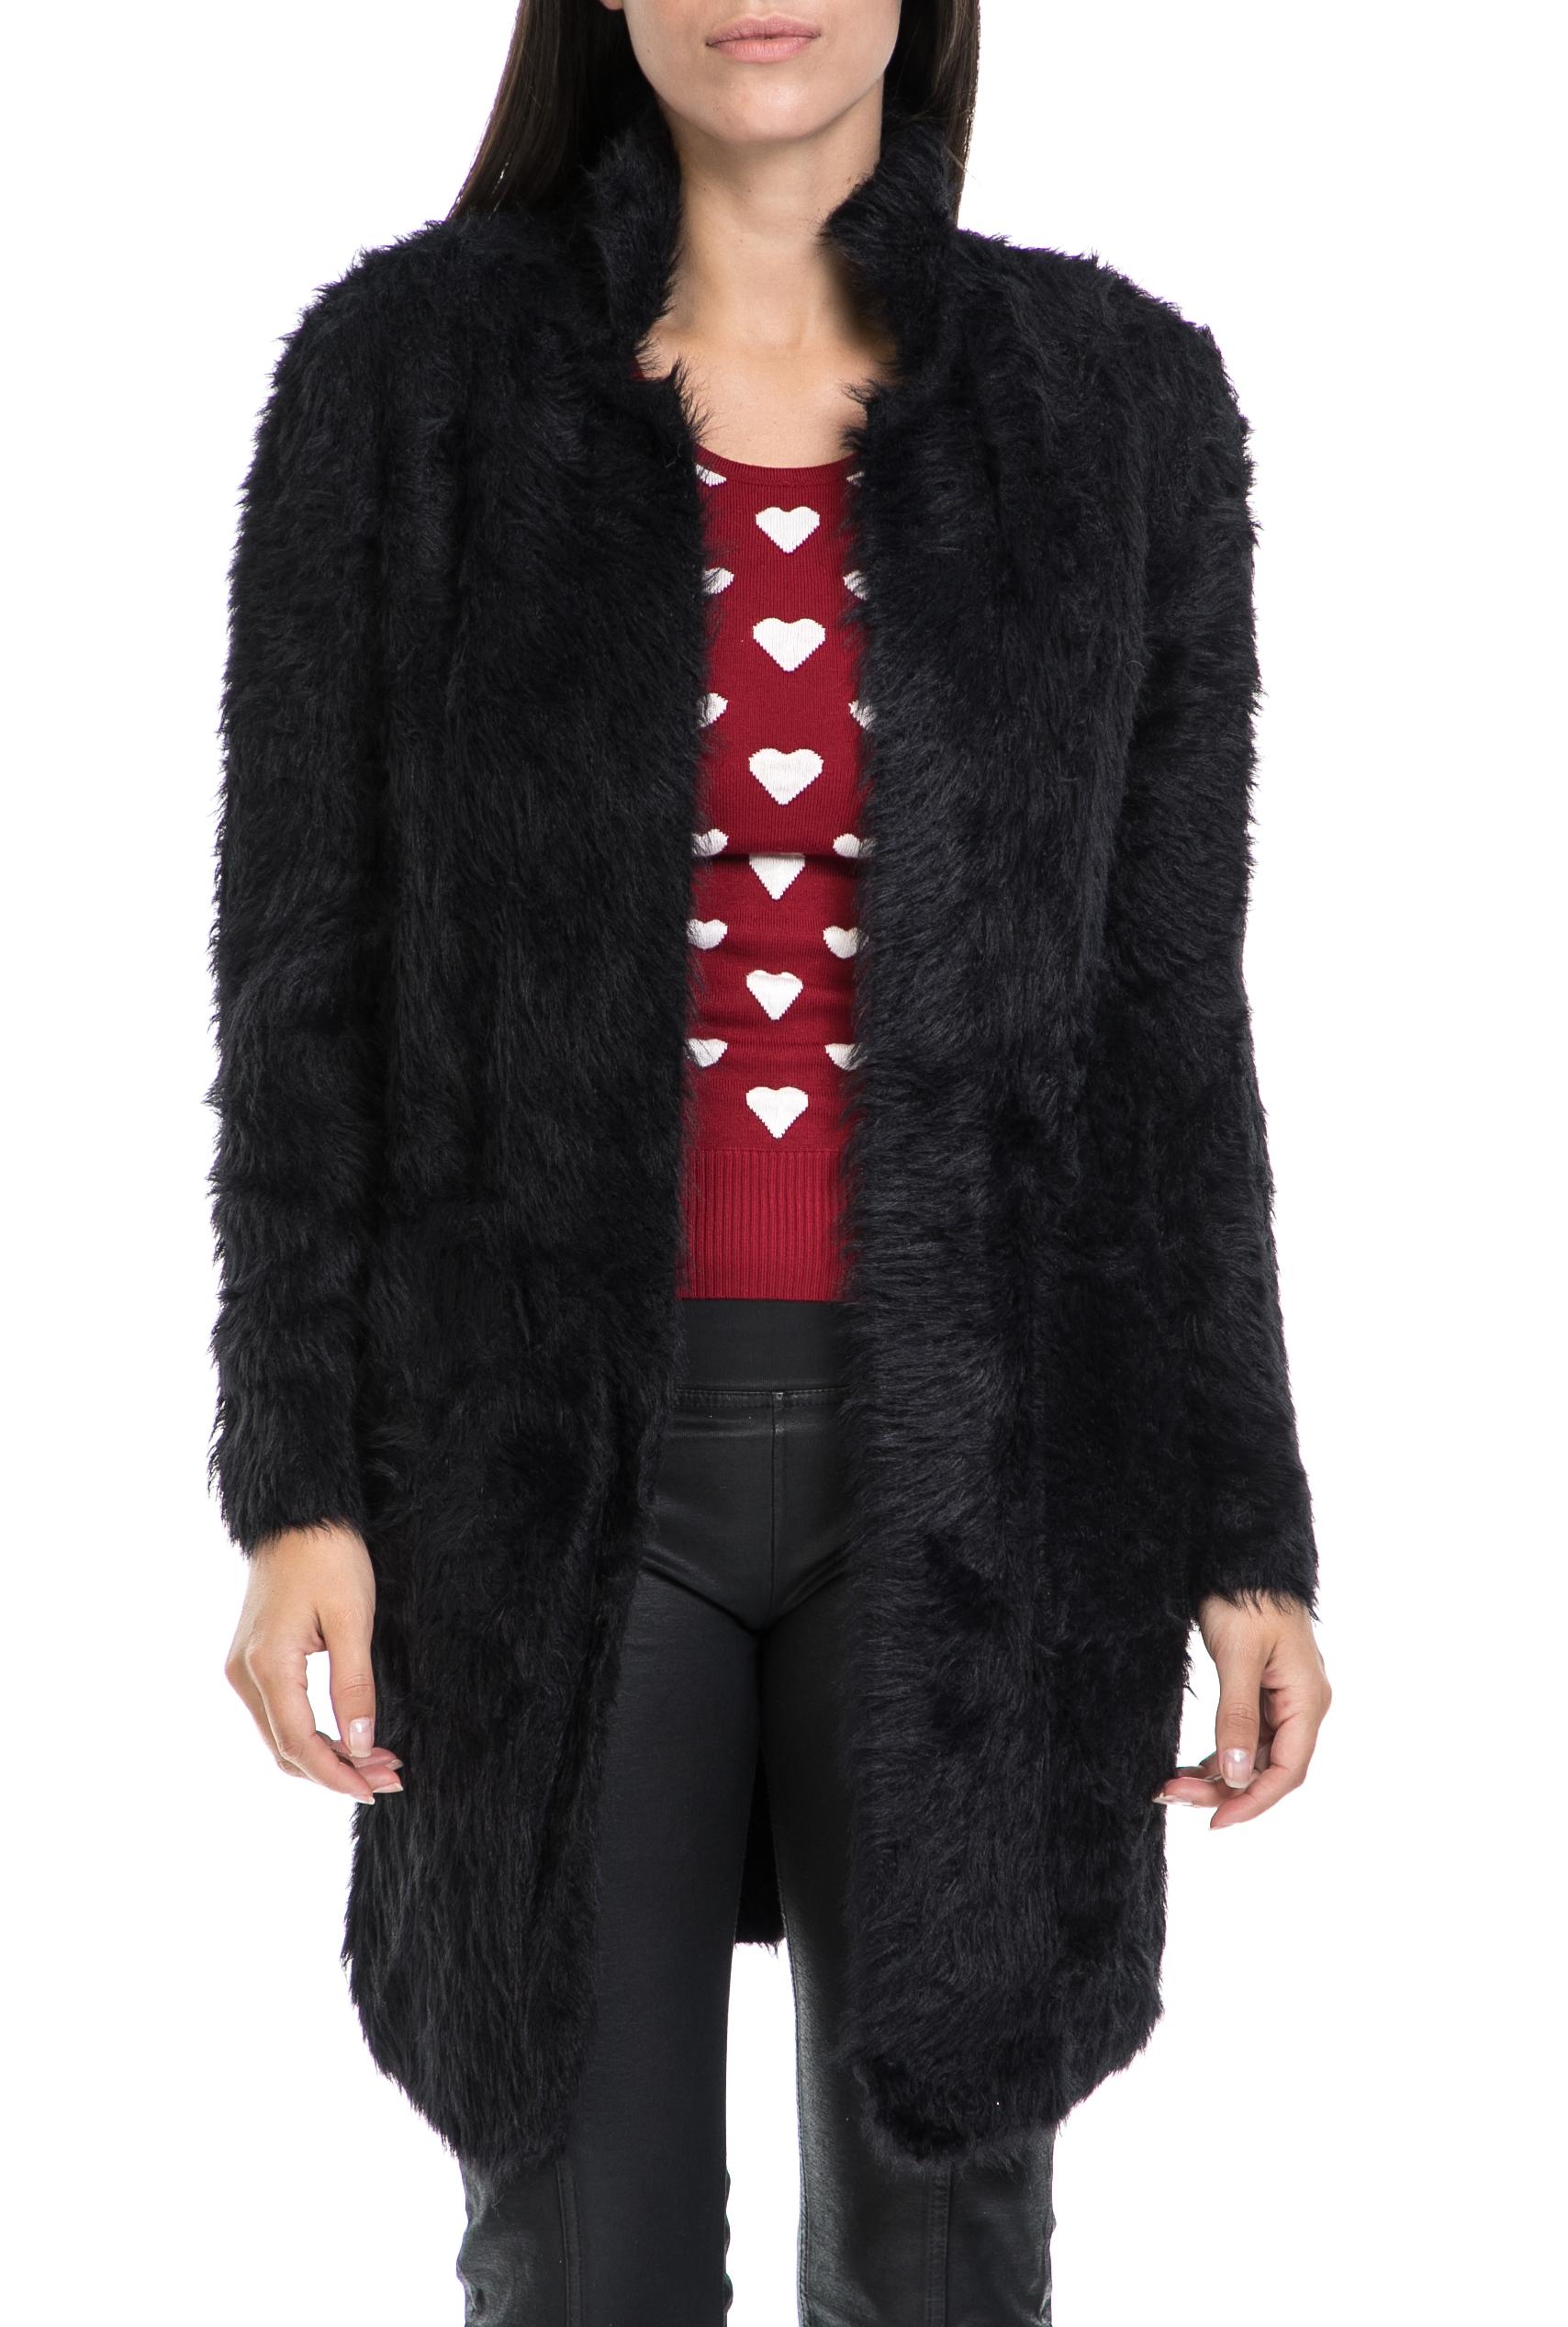 MOLLY BRACKEN - Γυναικεία ζακέτα MOLLY BRACKEN μαύρη γυναικεία ρούχα πλεκτά ζακέτες ζακέτες